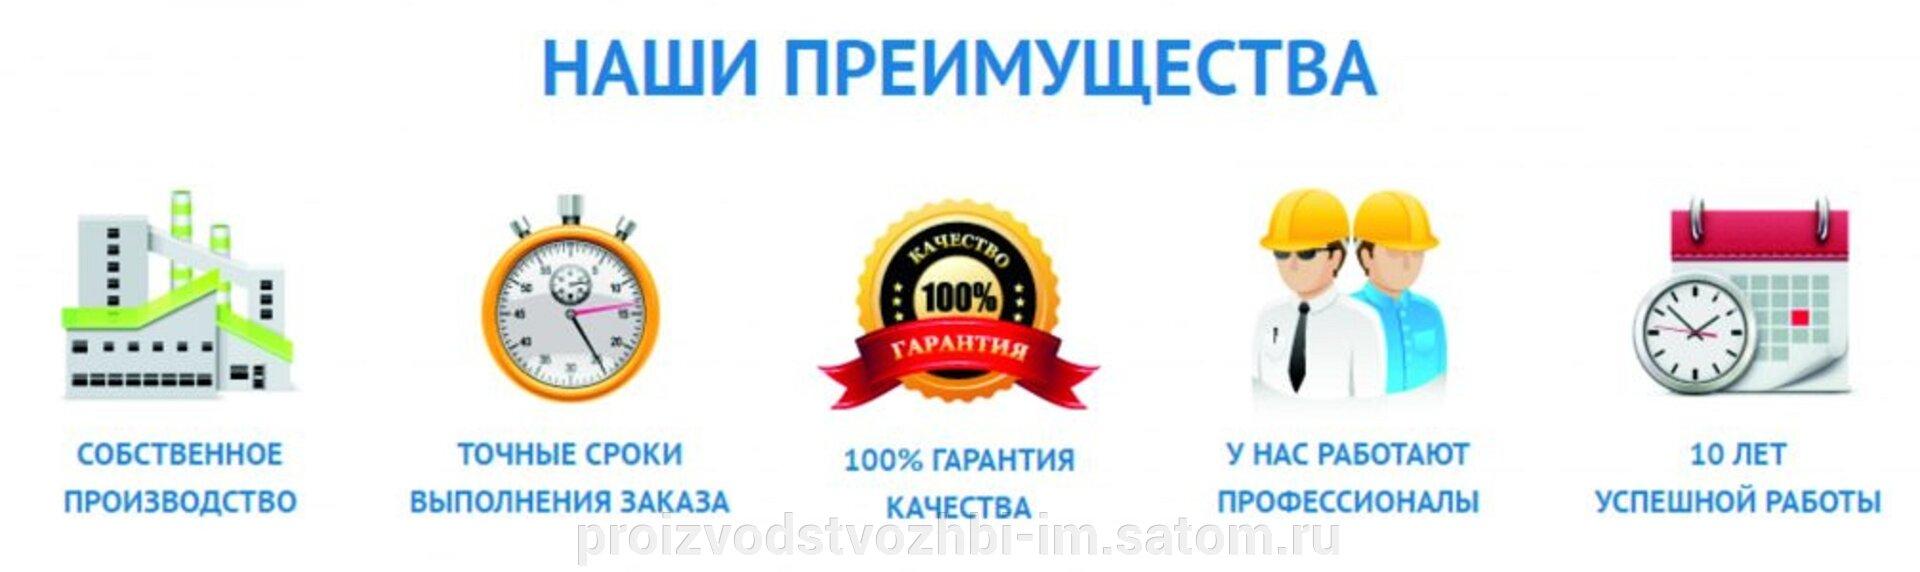 Лоток кабельный ЛК150.360.120-4а - фото pic_ca3ccaecdcfa139a1d379873625f01bd_1920x9000_1.jpg